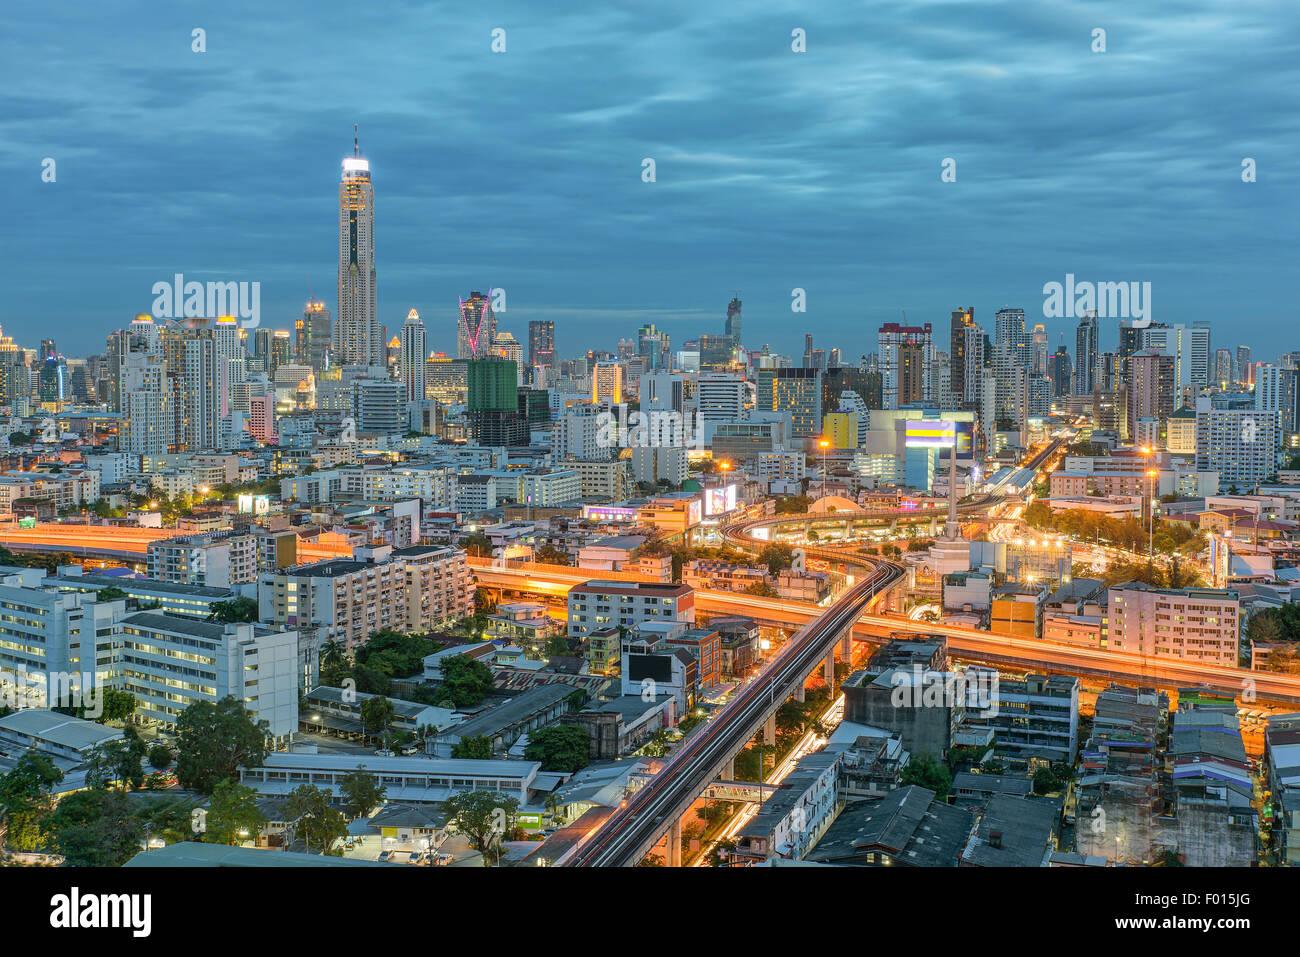 Bangkok City in vista notturna con bel cielo, Thailandia Immagini Stock